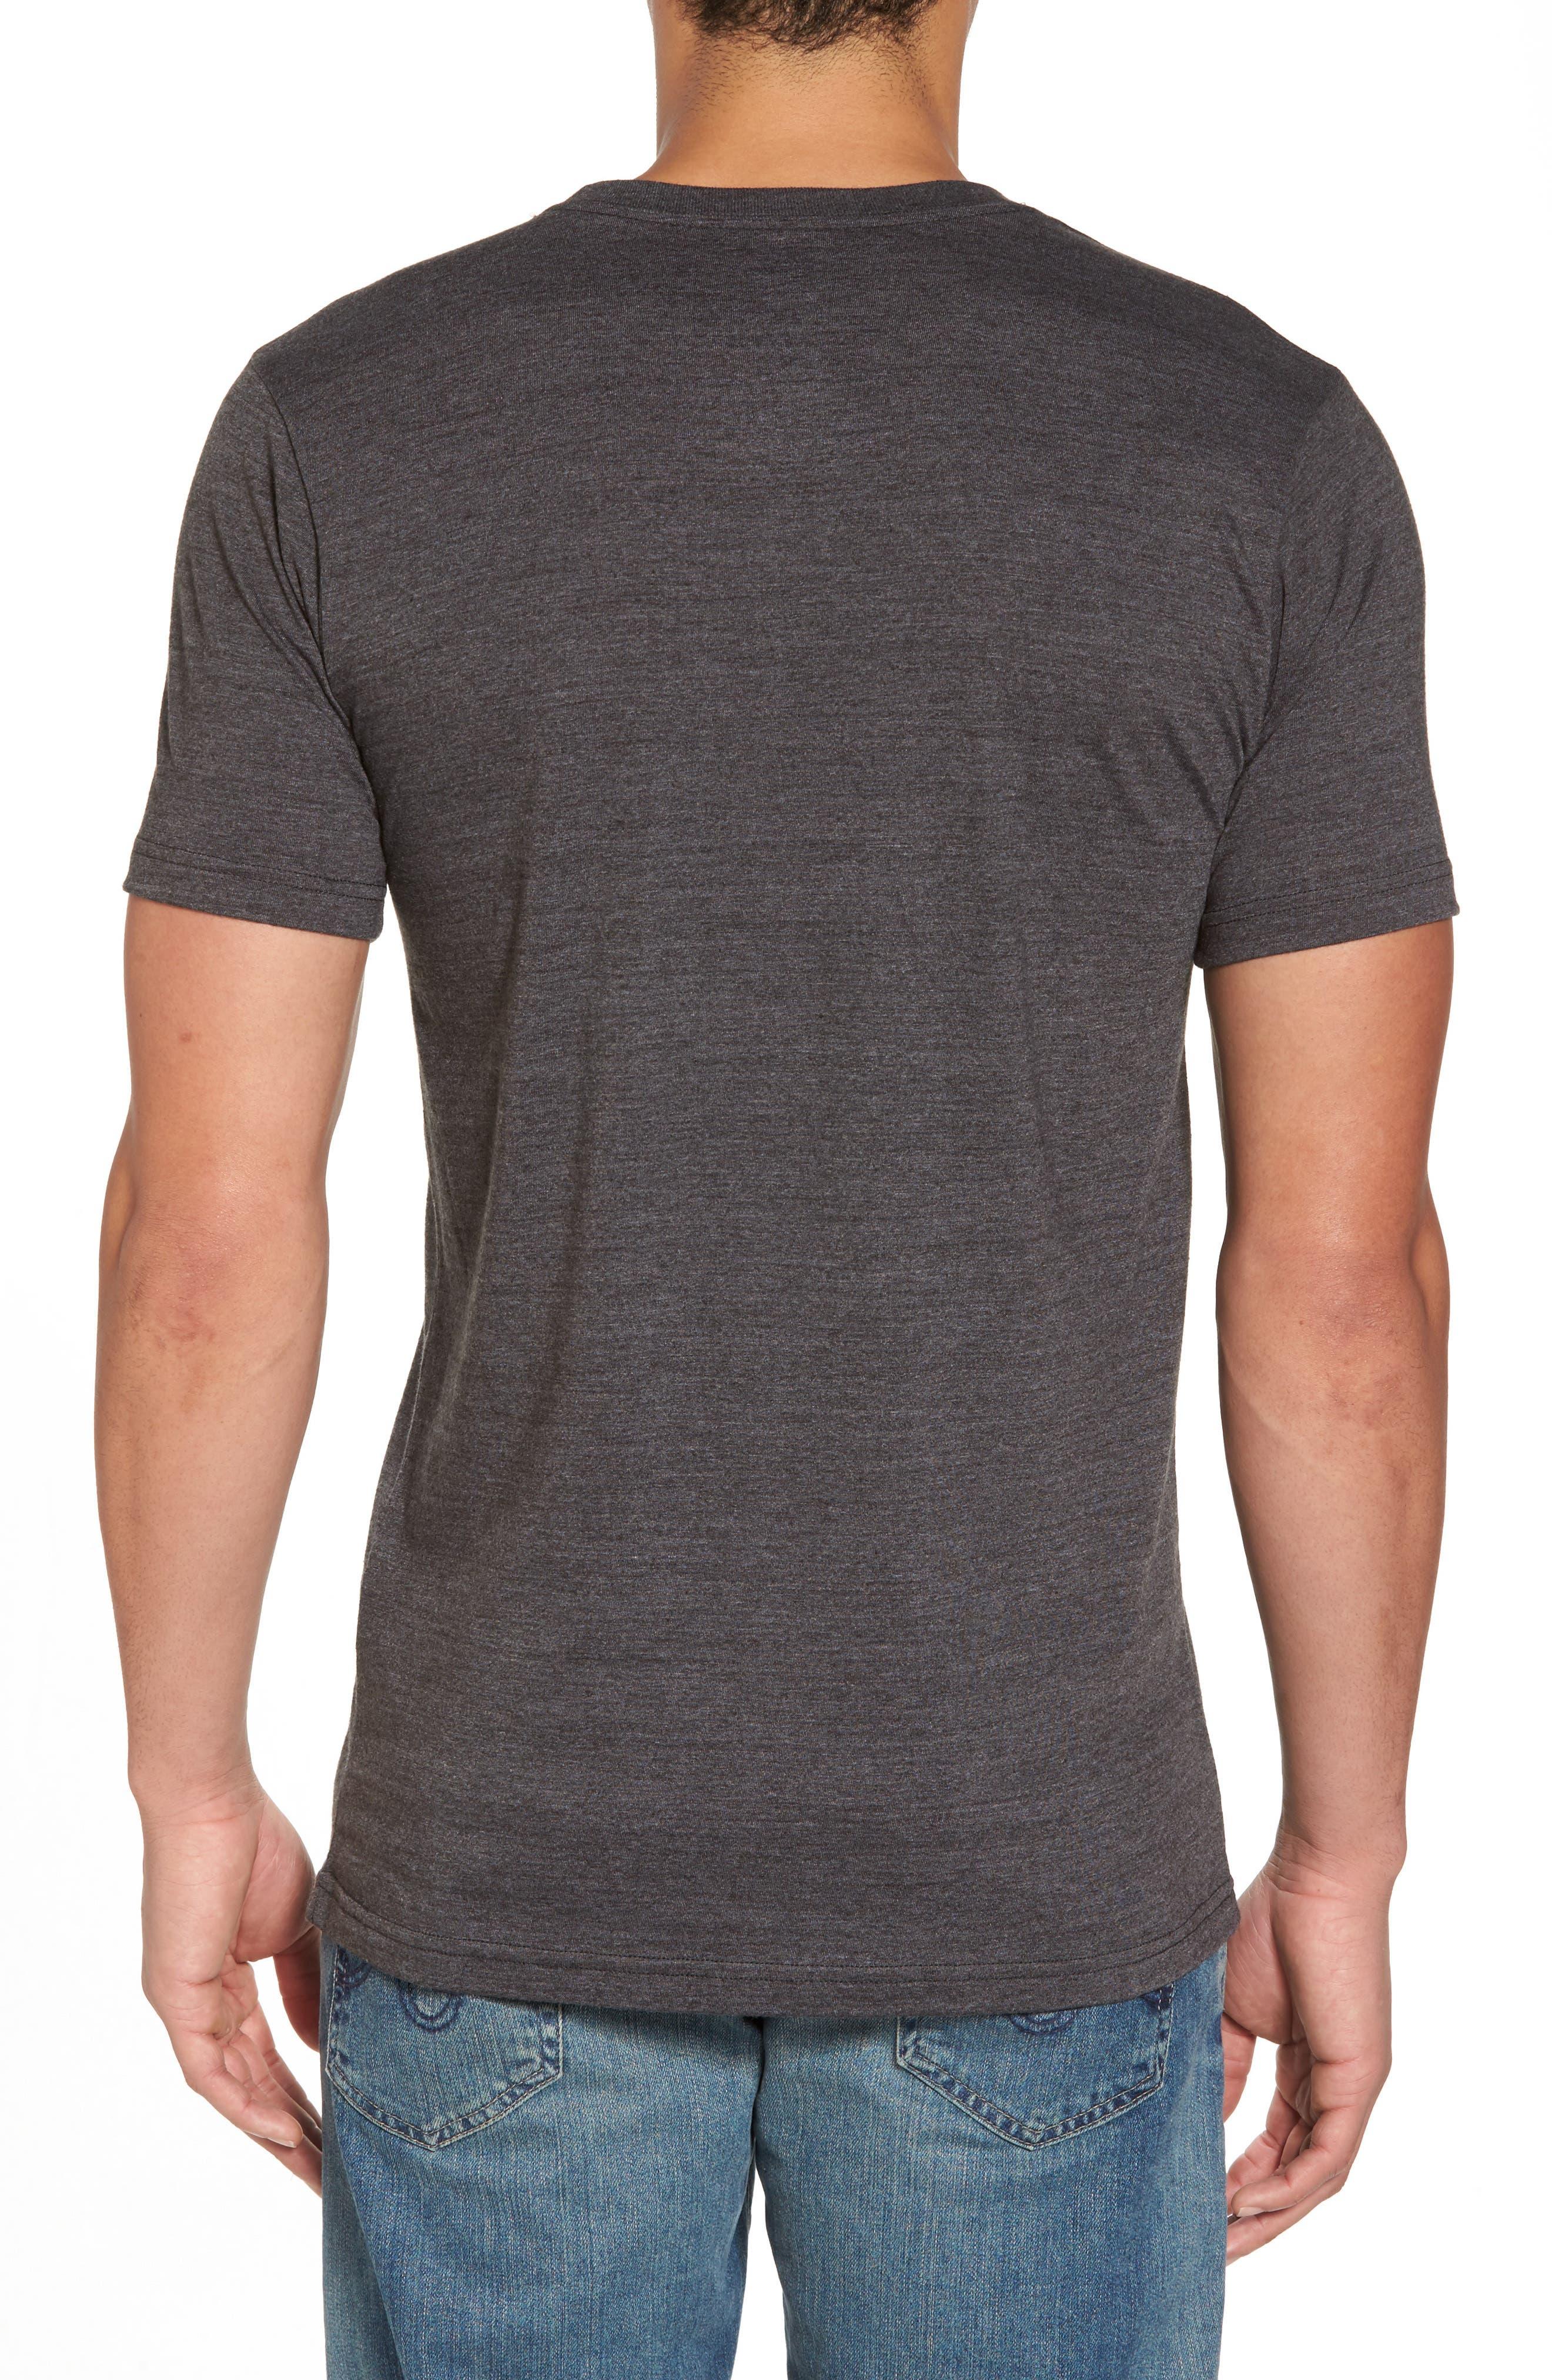 Half Dome T-Shirt,                             Alternate thumbnail 2, color,                             021